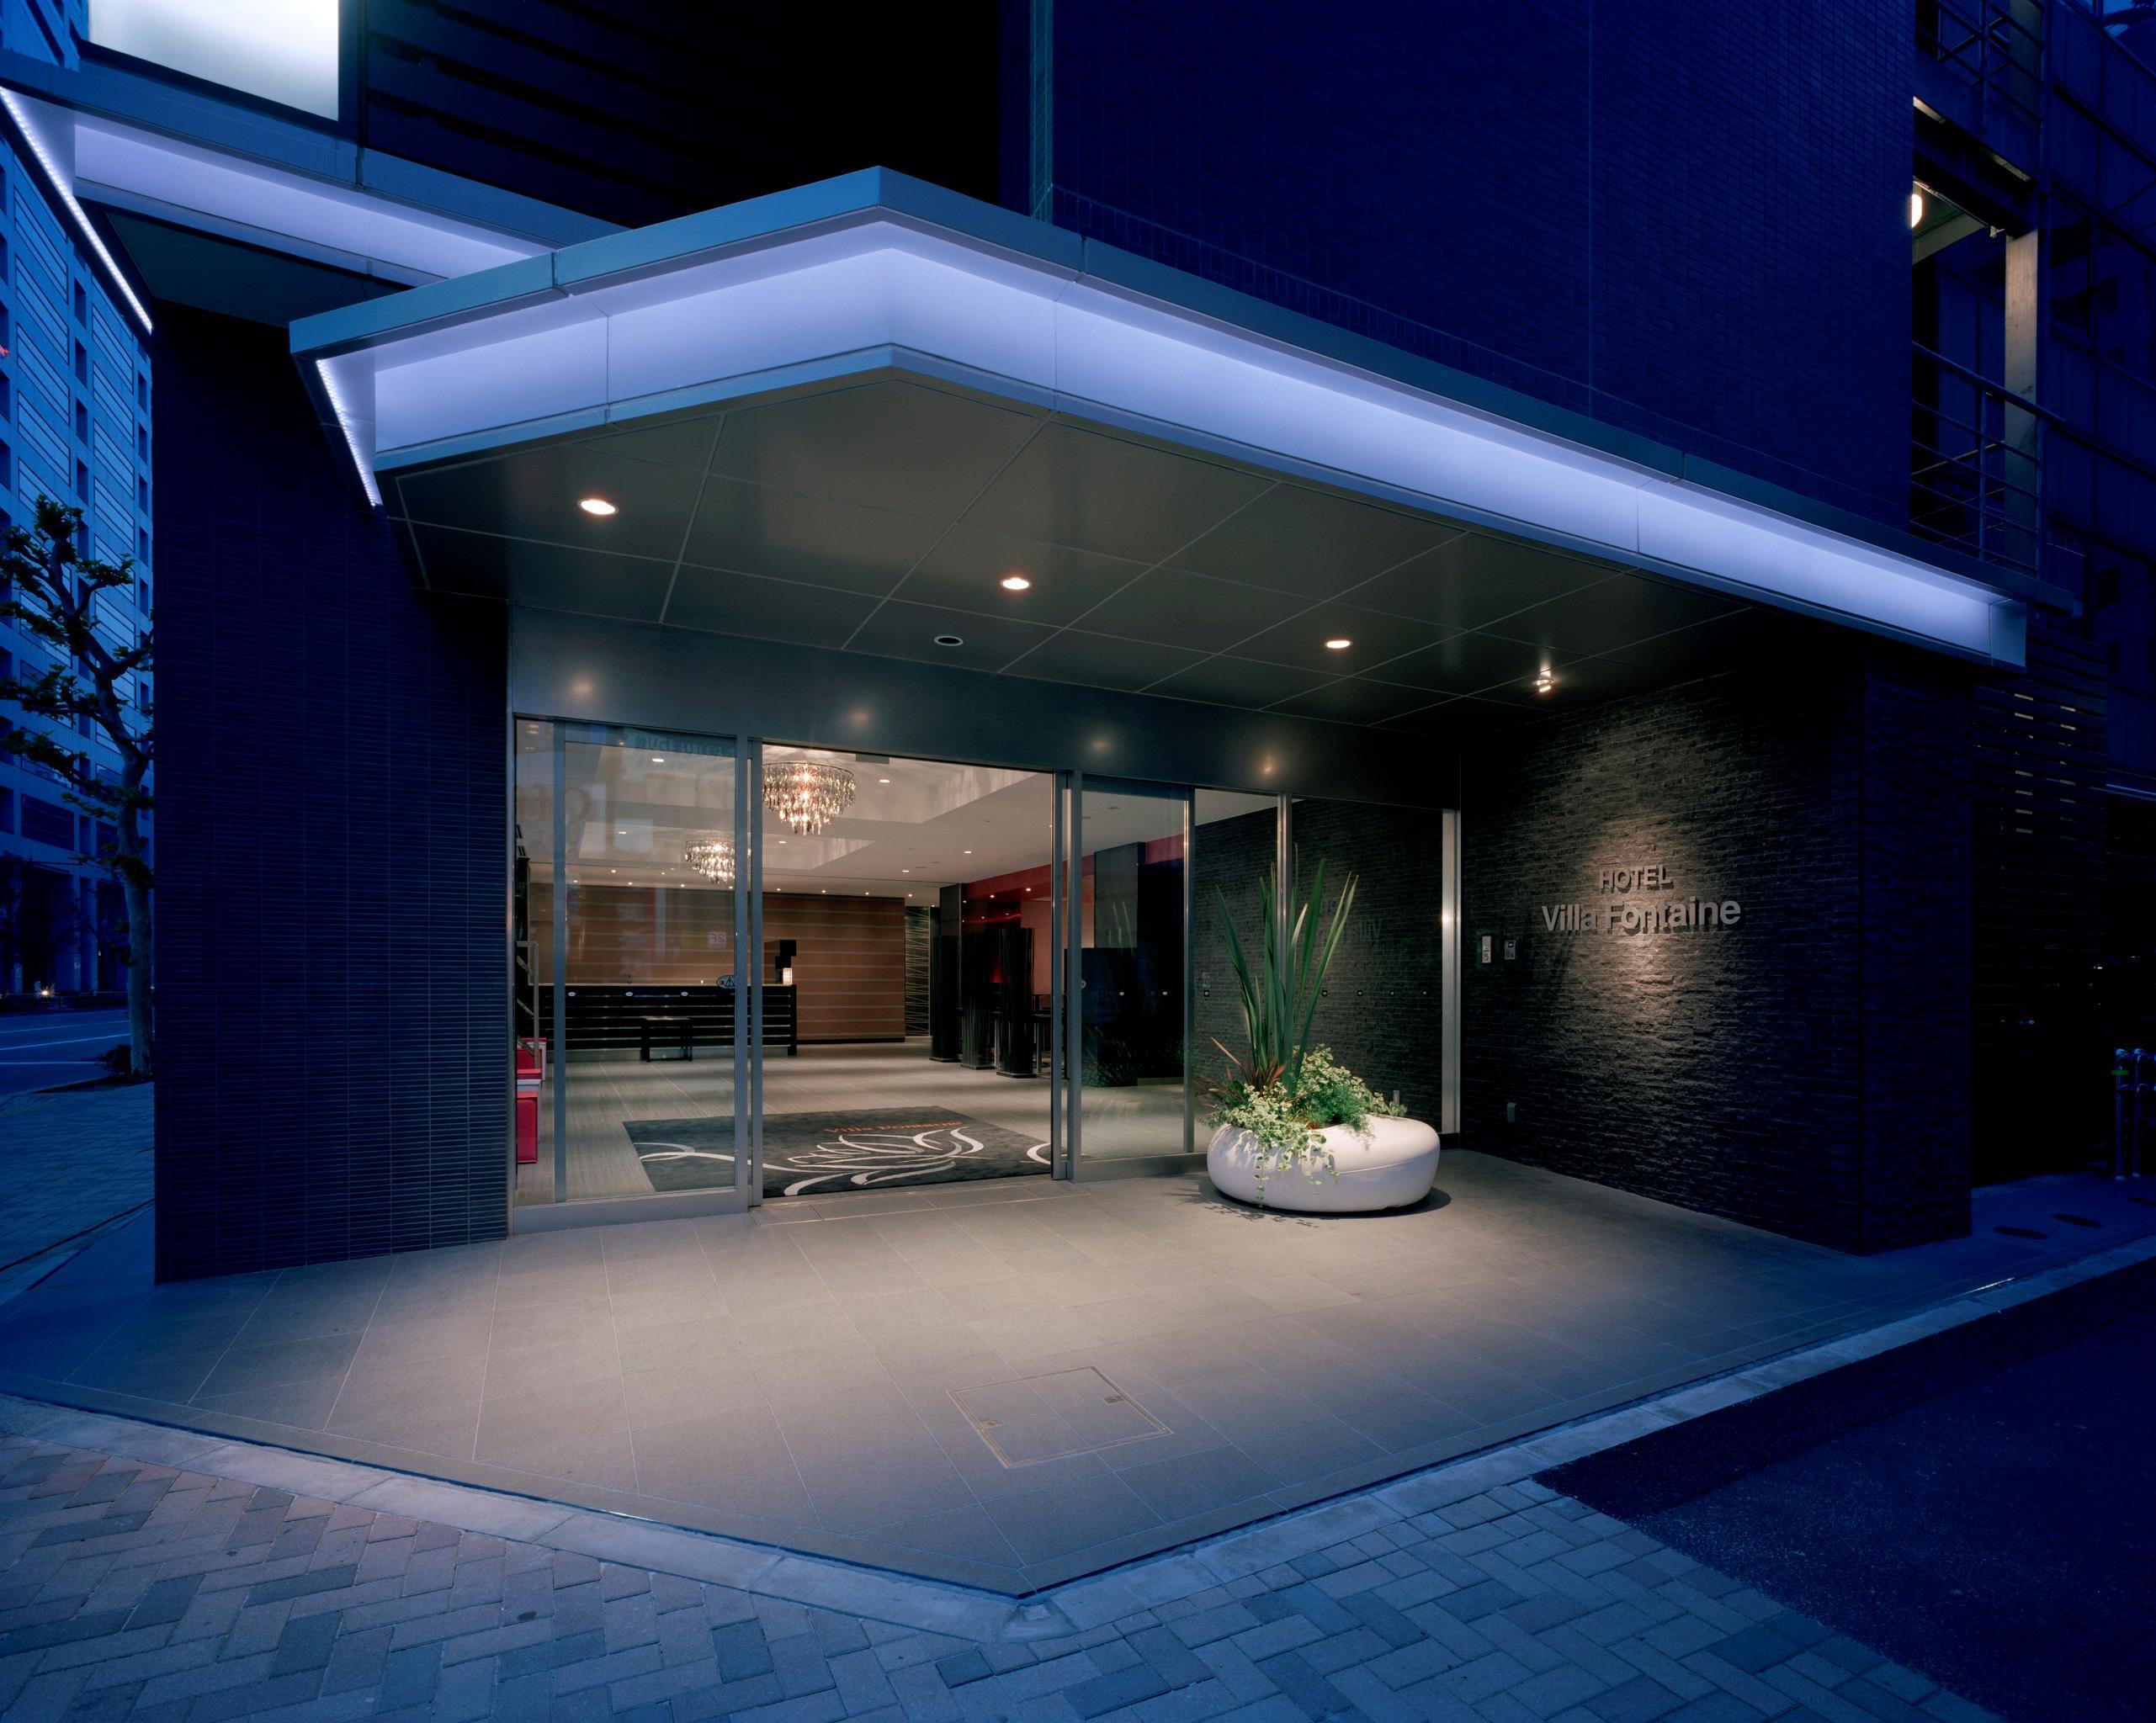 Hotel Villa Fontaine茅場町, 東京 - 比較優惠